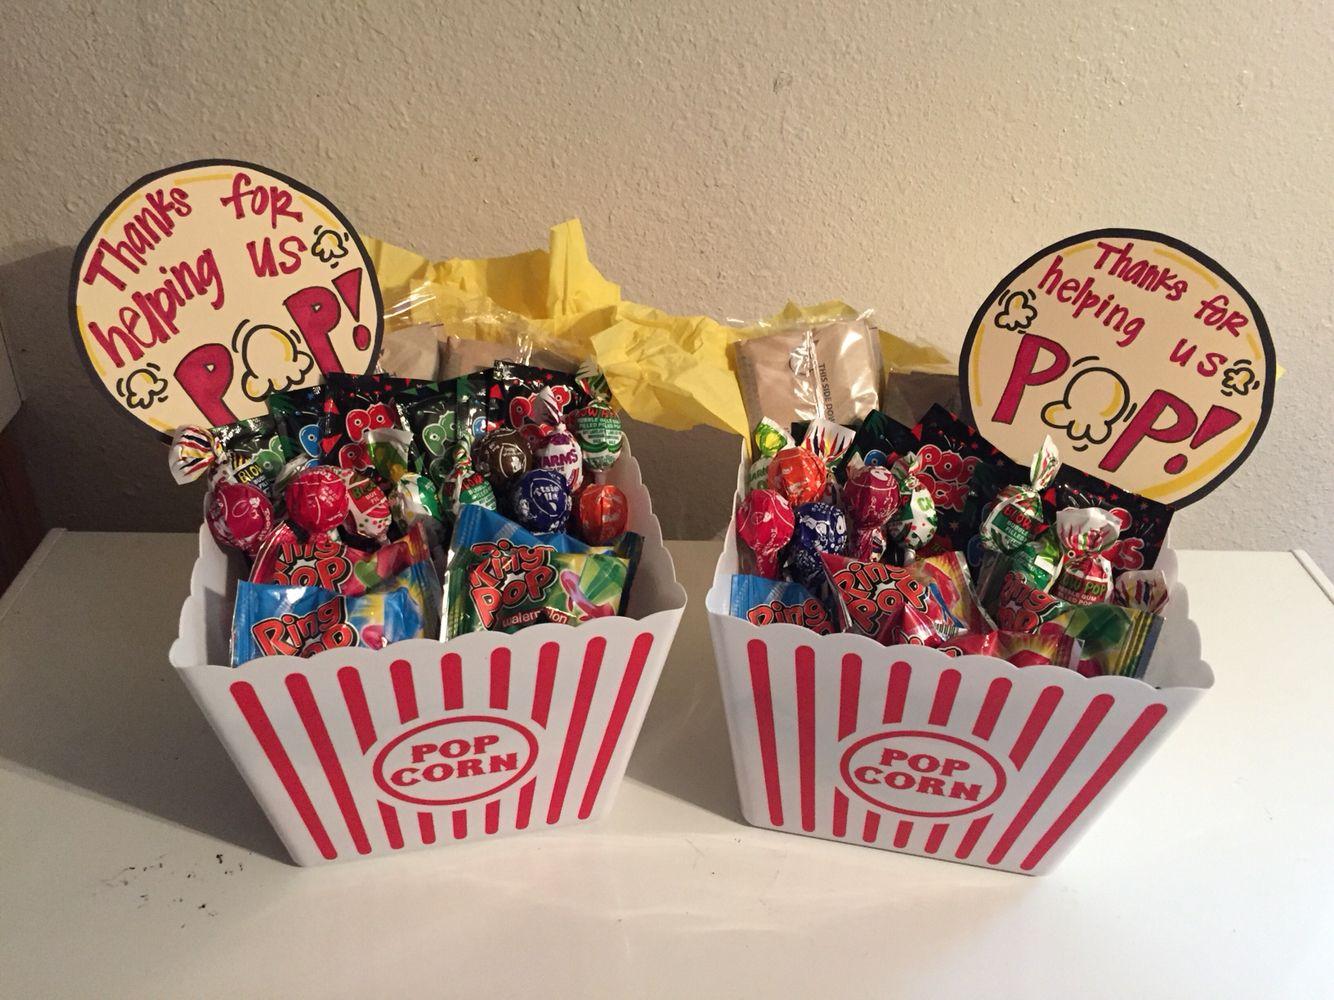 Homemade Thank You Gift Basket Ideas  Thanks For Helping Us Pop Thank You Gift Baskets for